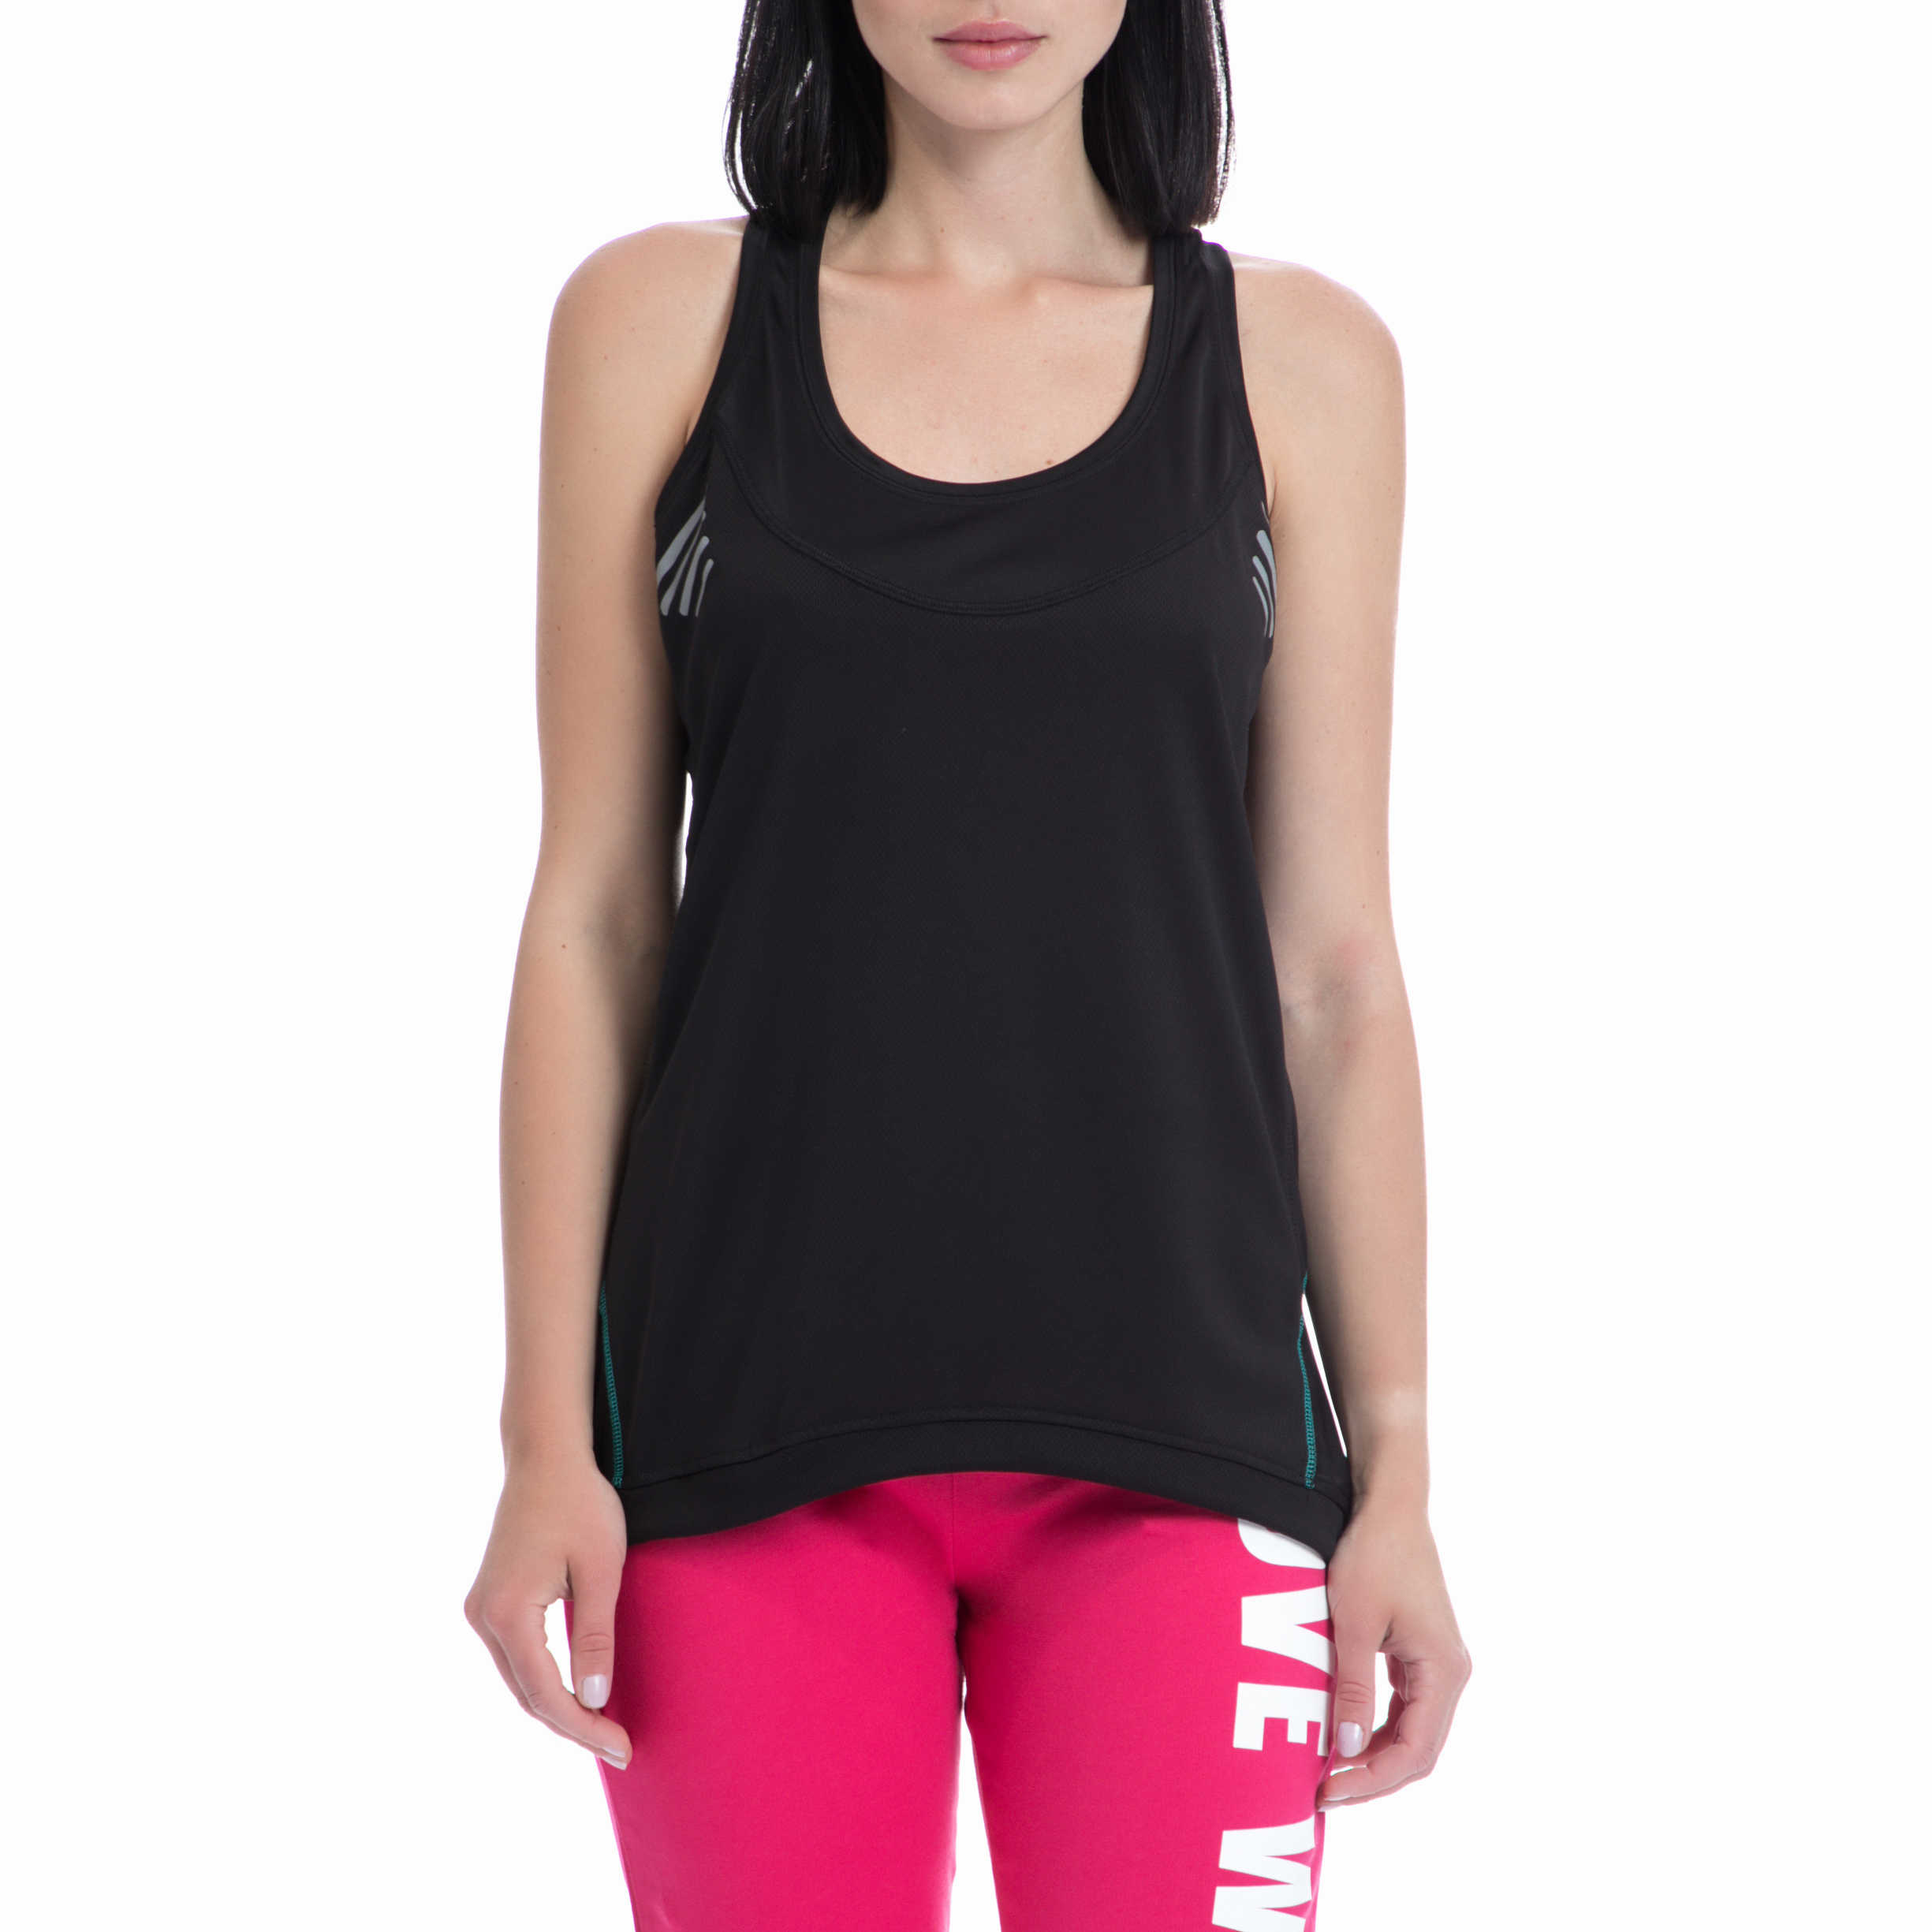 BODYTALK - Γυναικεία αμάνικη μπλούζα BODYTALK μαύρη γυναικεία ρούχα αθλητικά t shirt τοπ